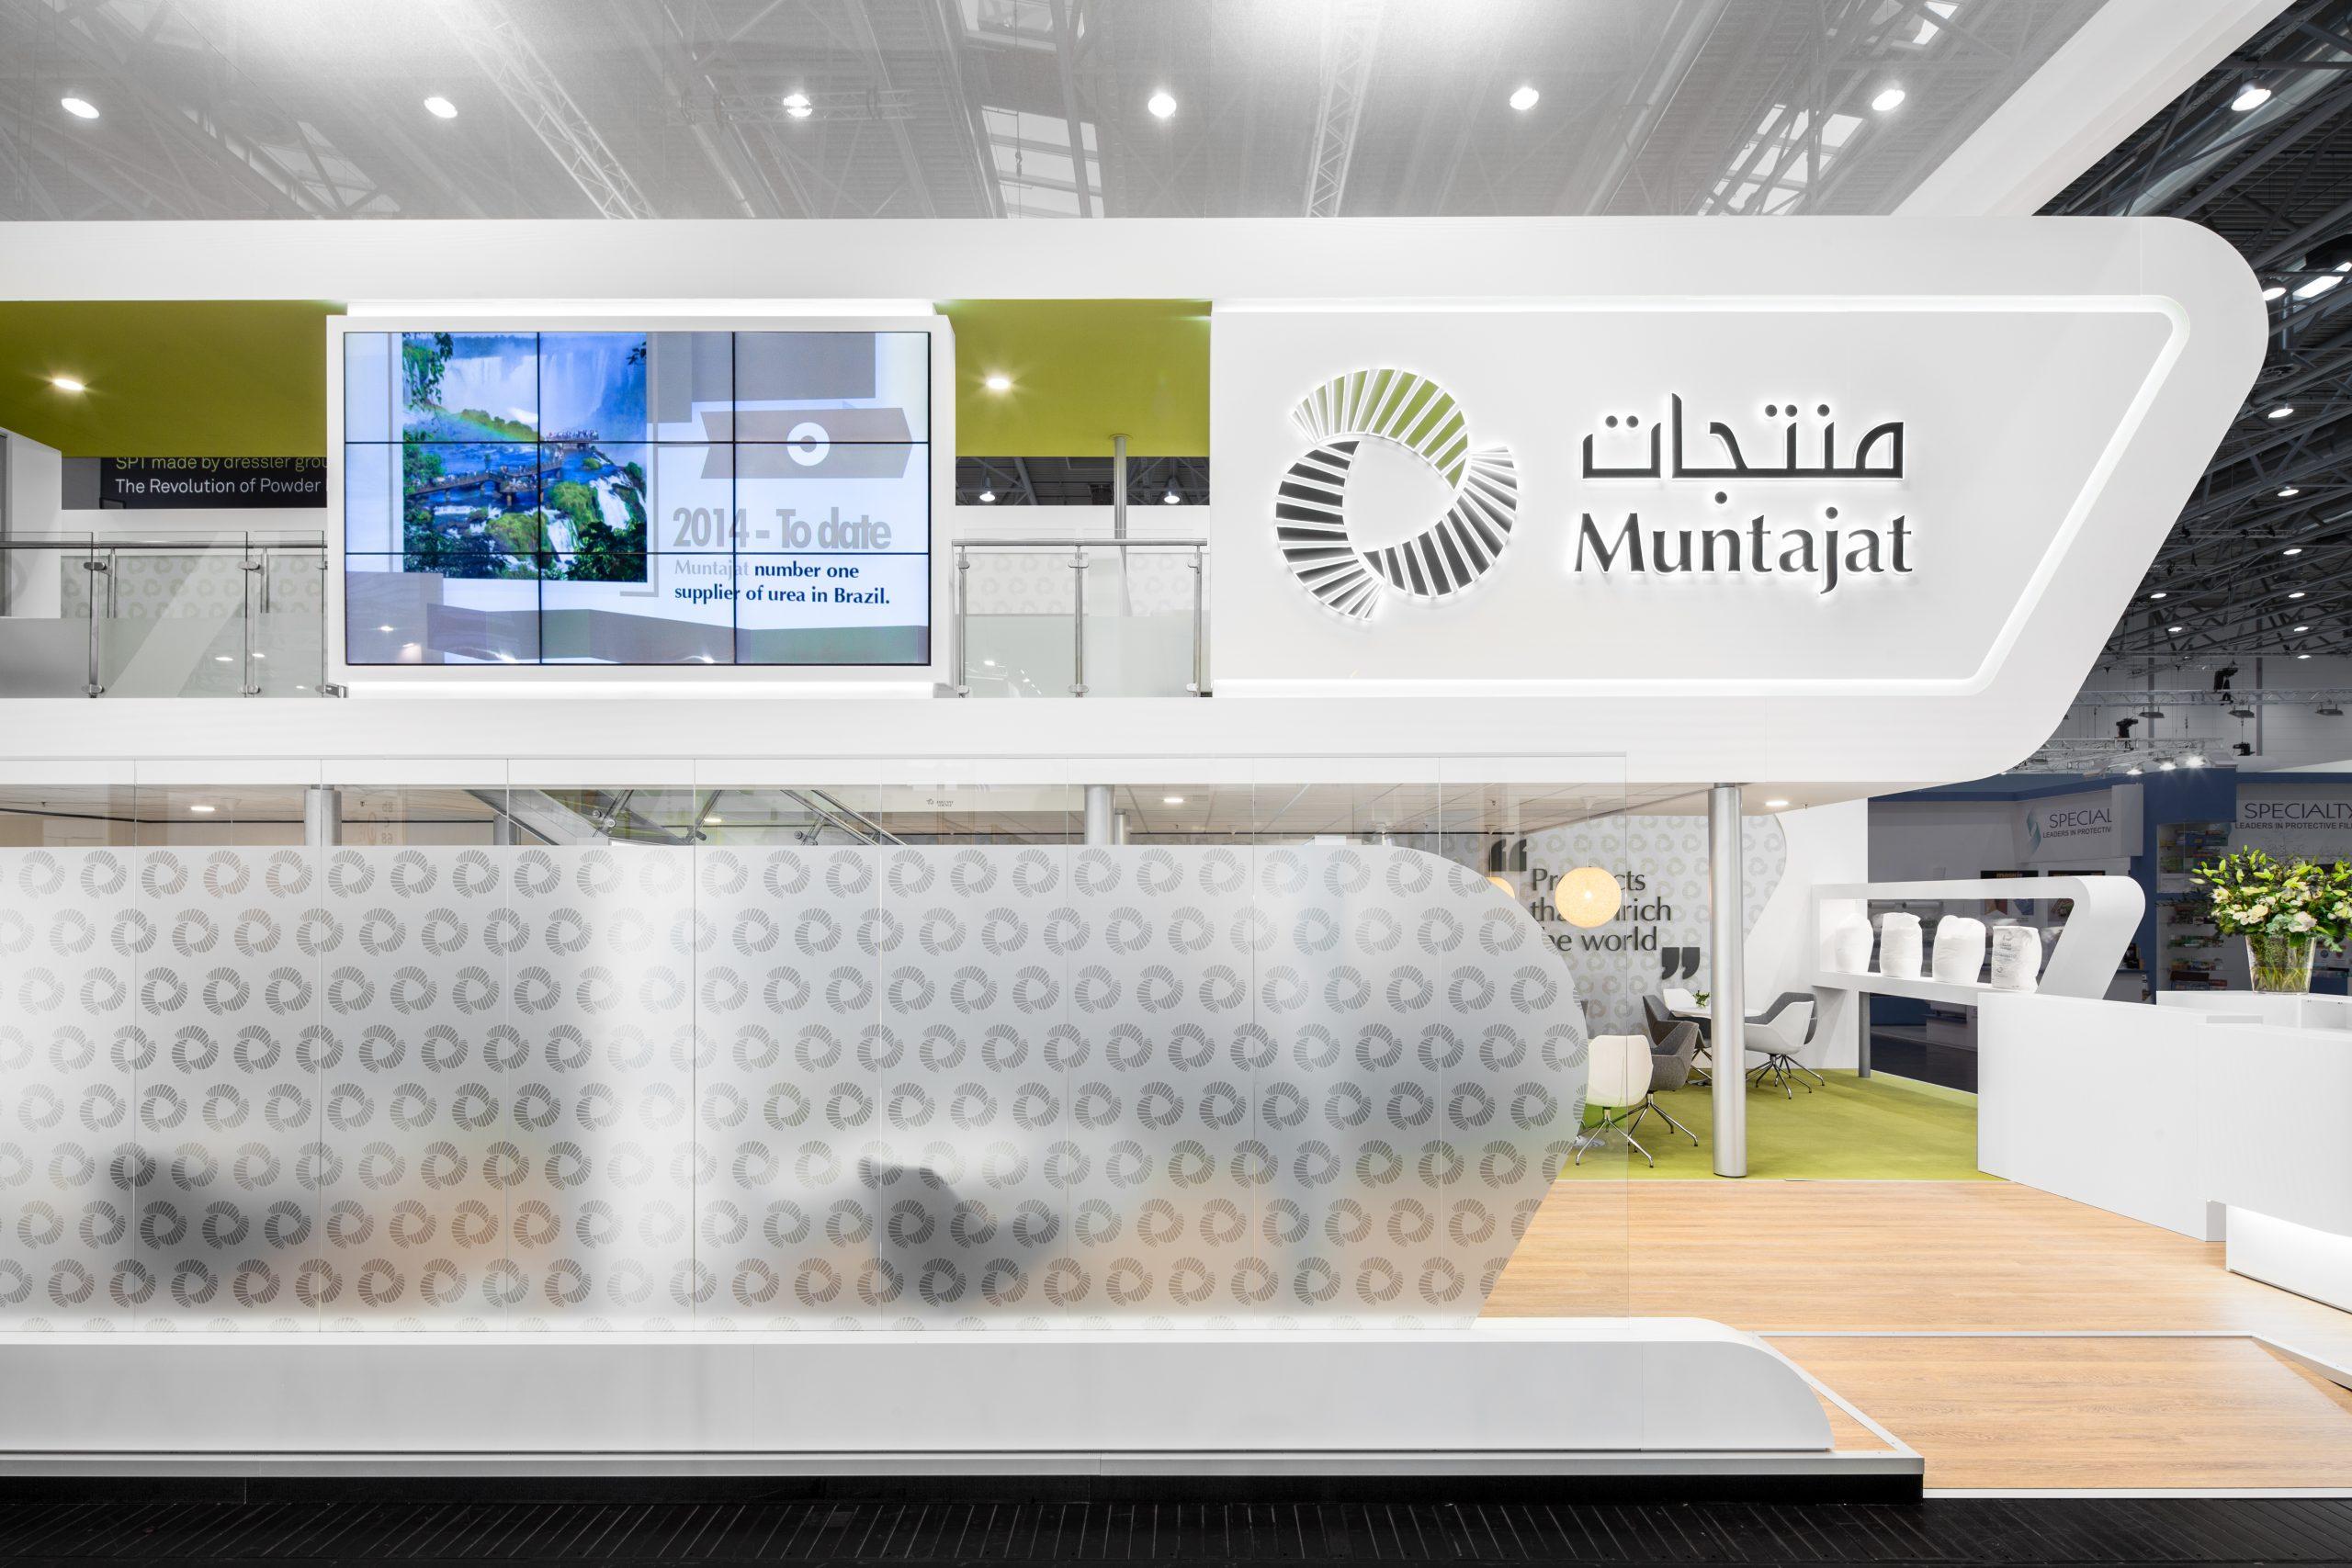 CAS Exhibition Partners - Muntajat - K 2019 - Düsseldorf - Standbouwfotografie #9461